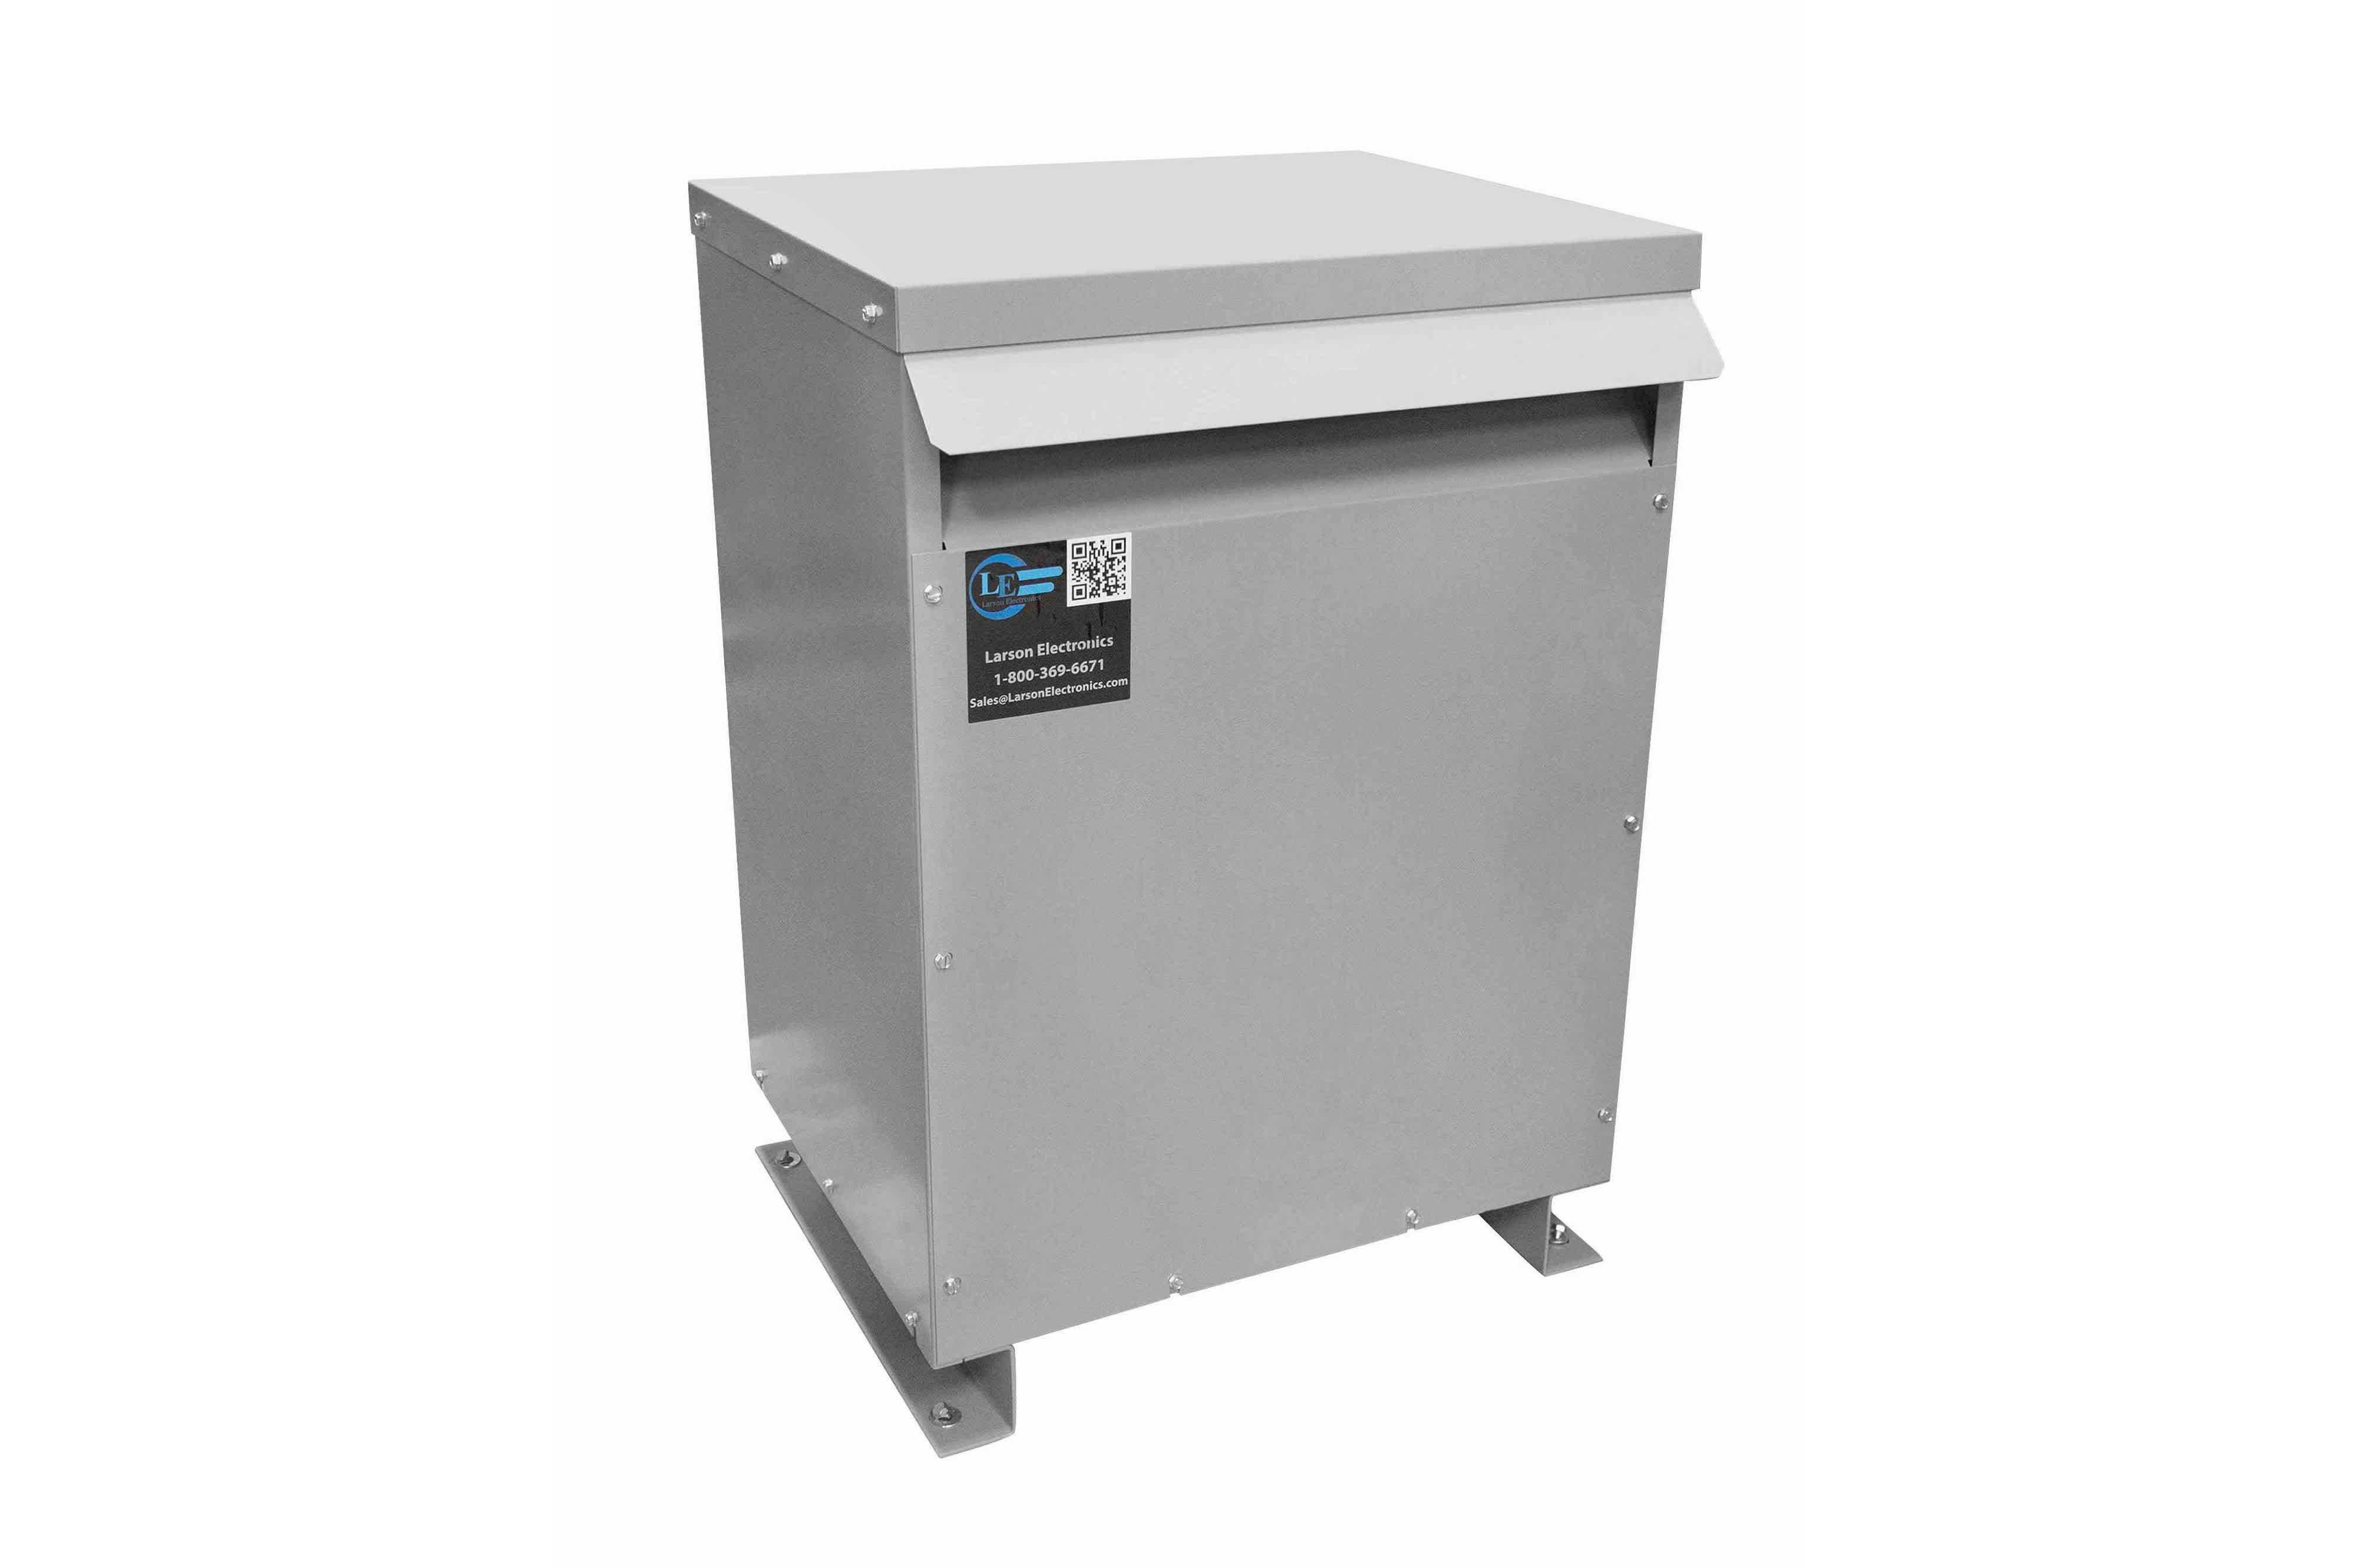 37.5 kVA 3PH Isolation Transformer, 575V Wye Primary, 400V Delta Secondary, N3R, Ventilated, 60 Hz